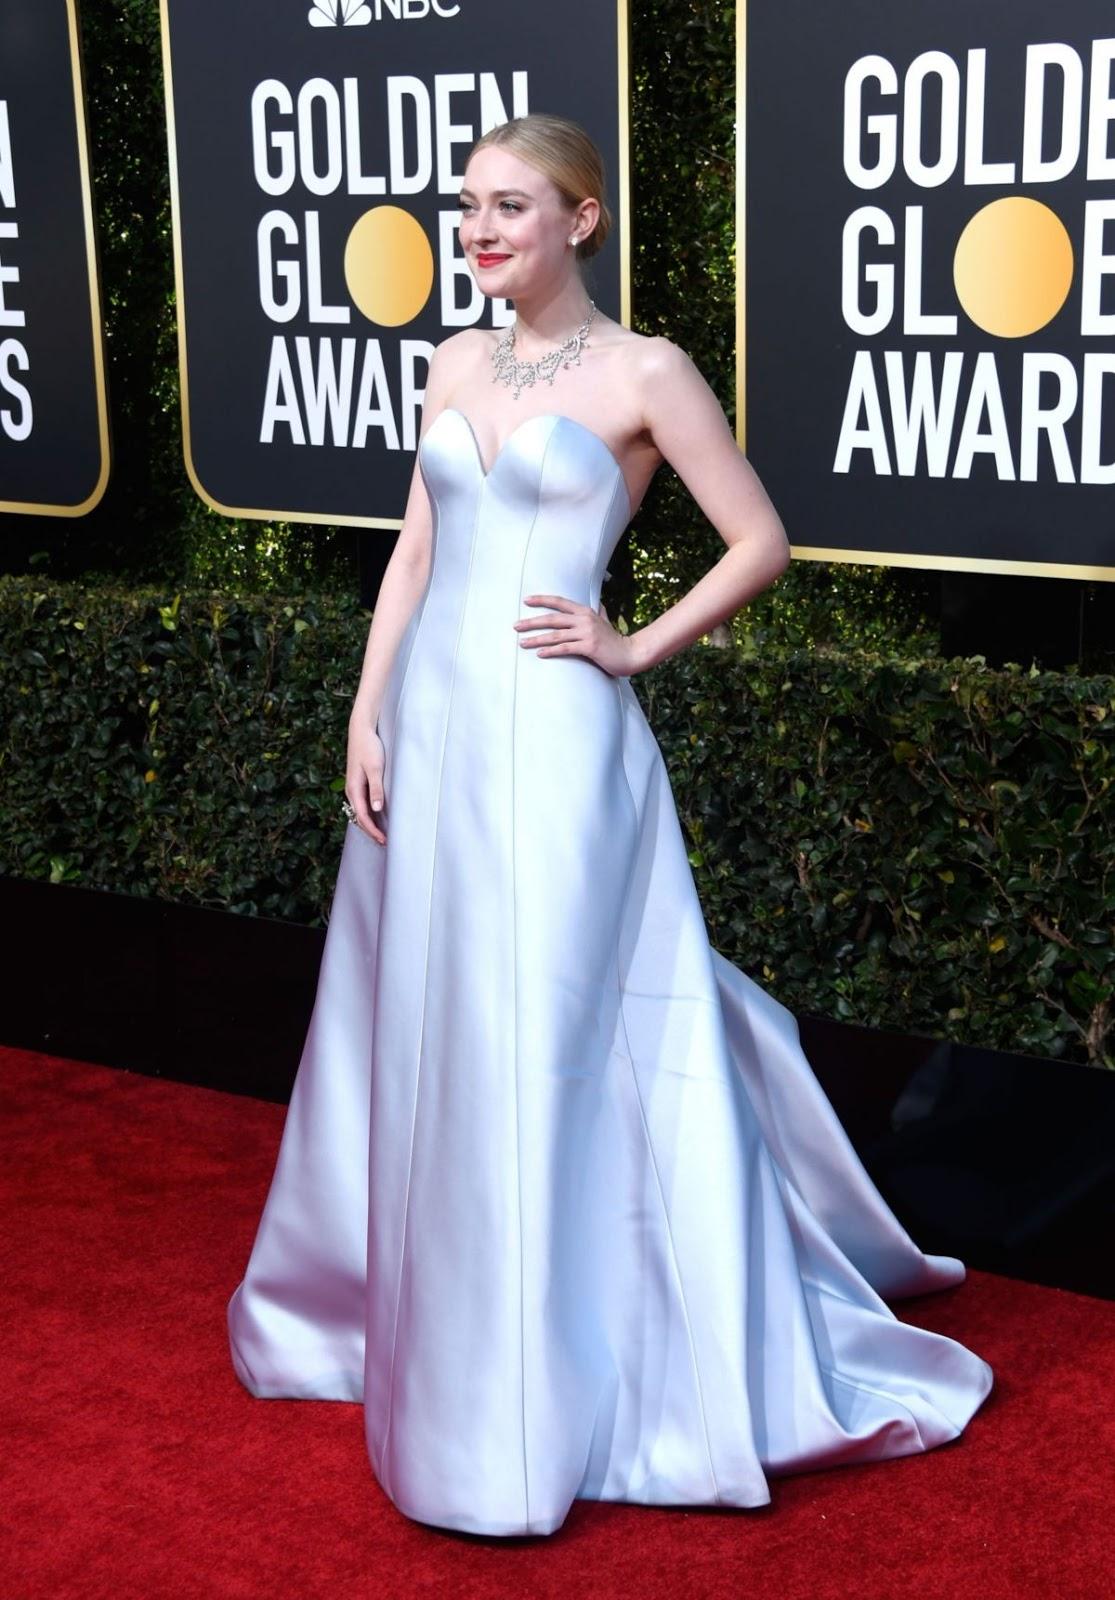 DAKOTA FANNING at 2019 Golden Globe Awards in Beverly Hills